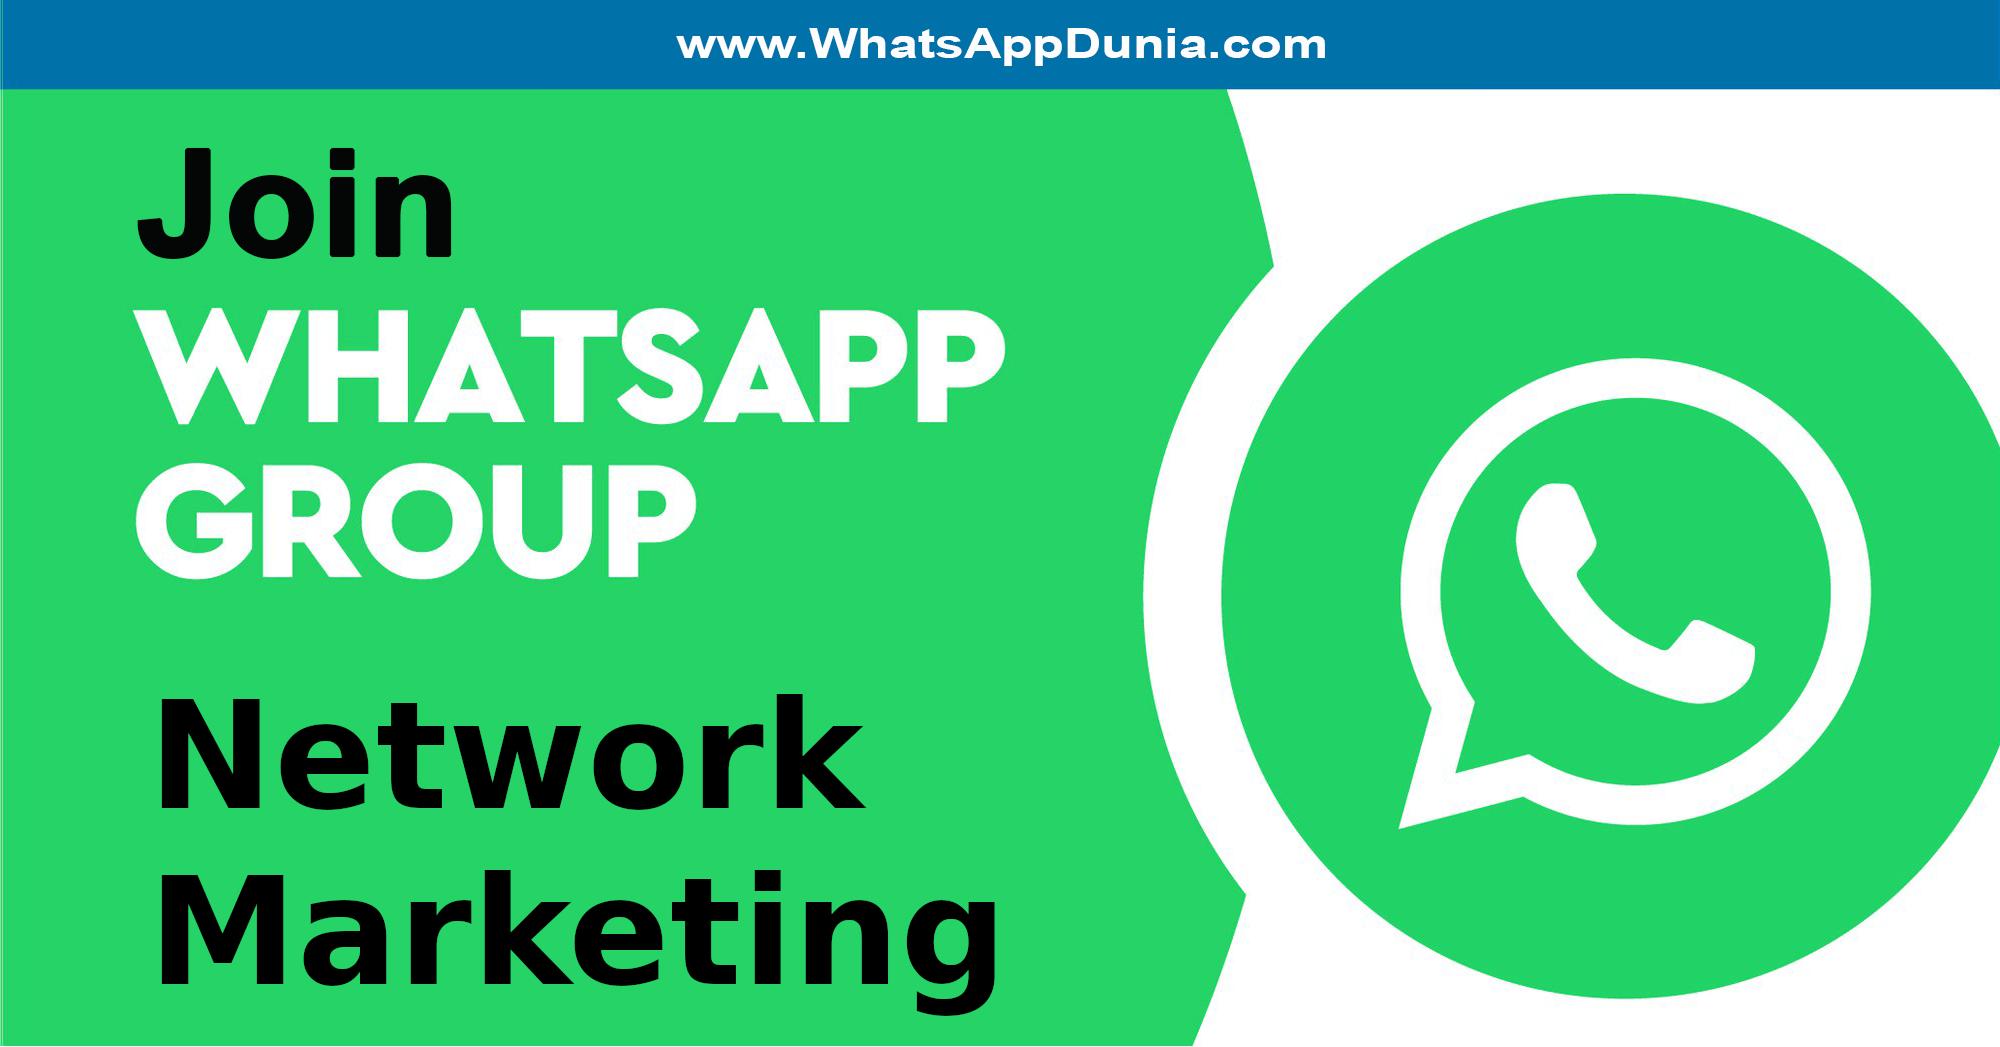 Network Marketing WhatsApp Group Links